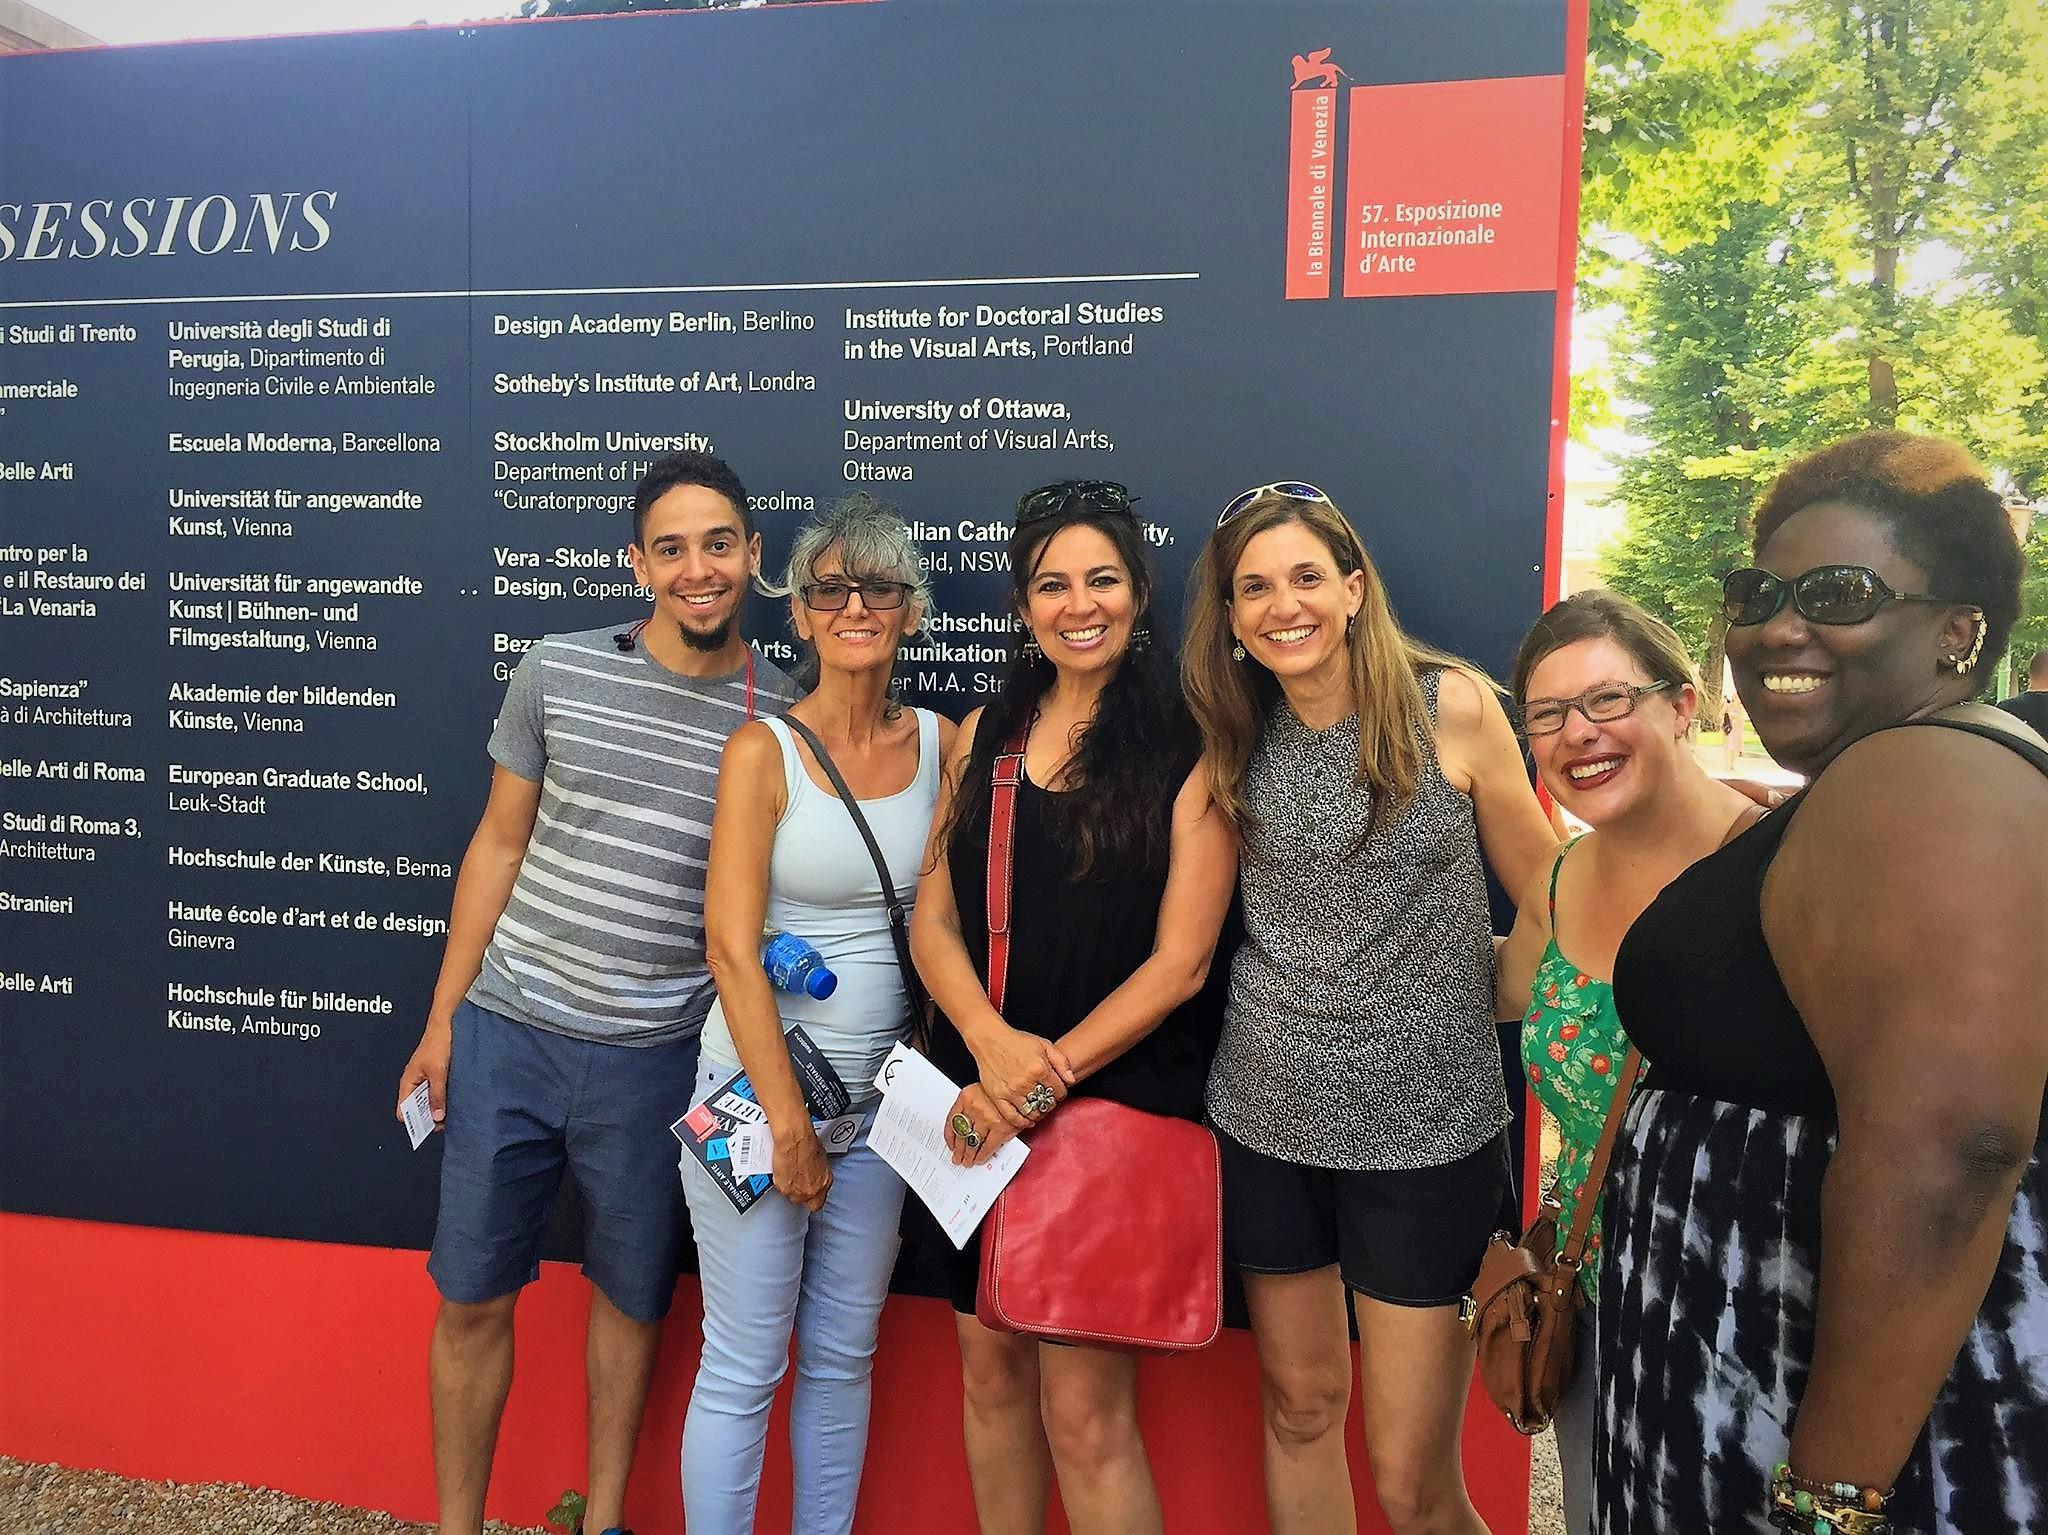 Biennale sessions banner at the Venice Biennale Giardini , Photo Credit: Simonetta Moro